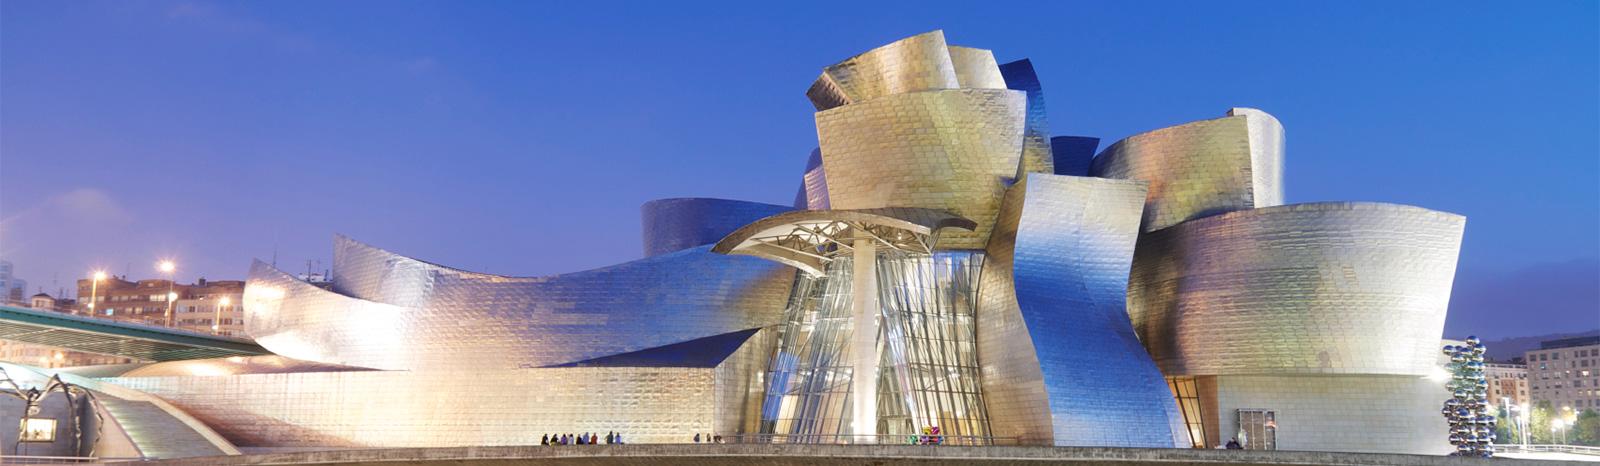 Bilbao, On-Ramp to Design Engineering: Parametric CAD